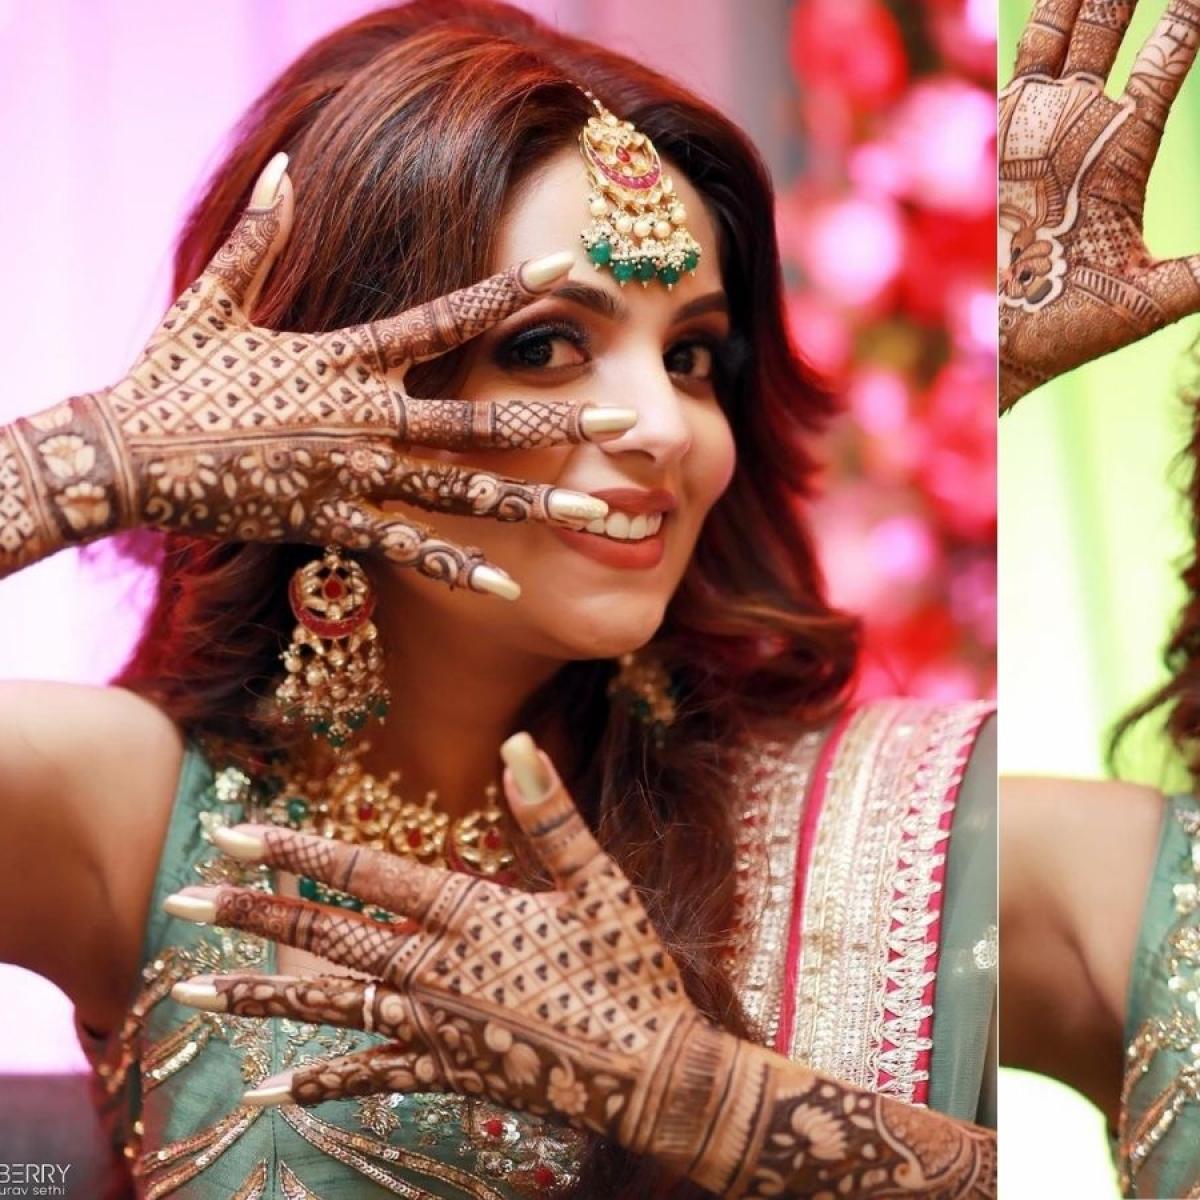 Sugandha Mishra shares stunning pics from Mehendi ceremony ahead of wedding with Sanket Bhosale